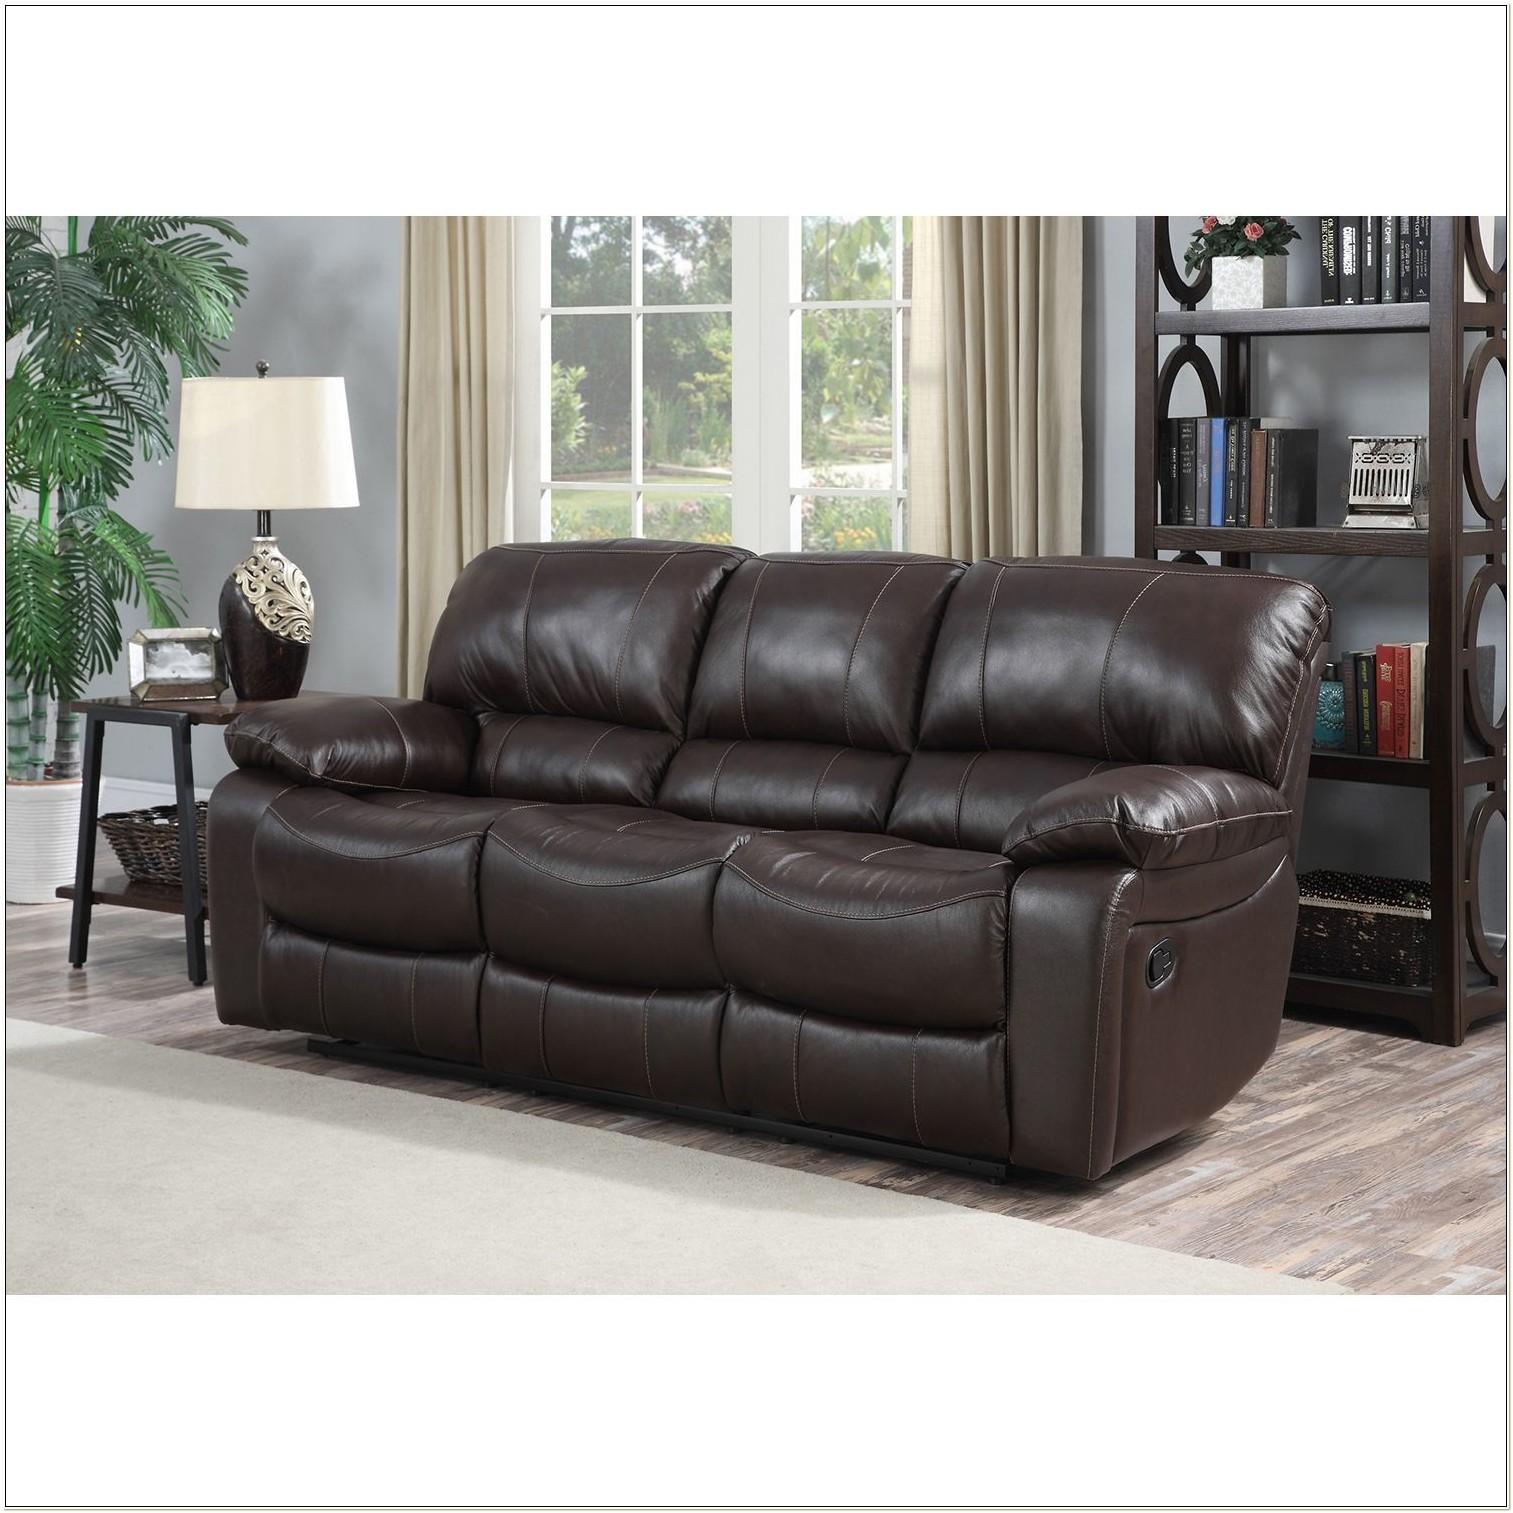 Sams Club Kingston Leather Furniture